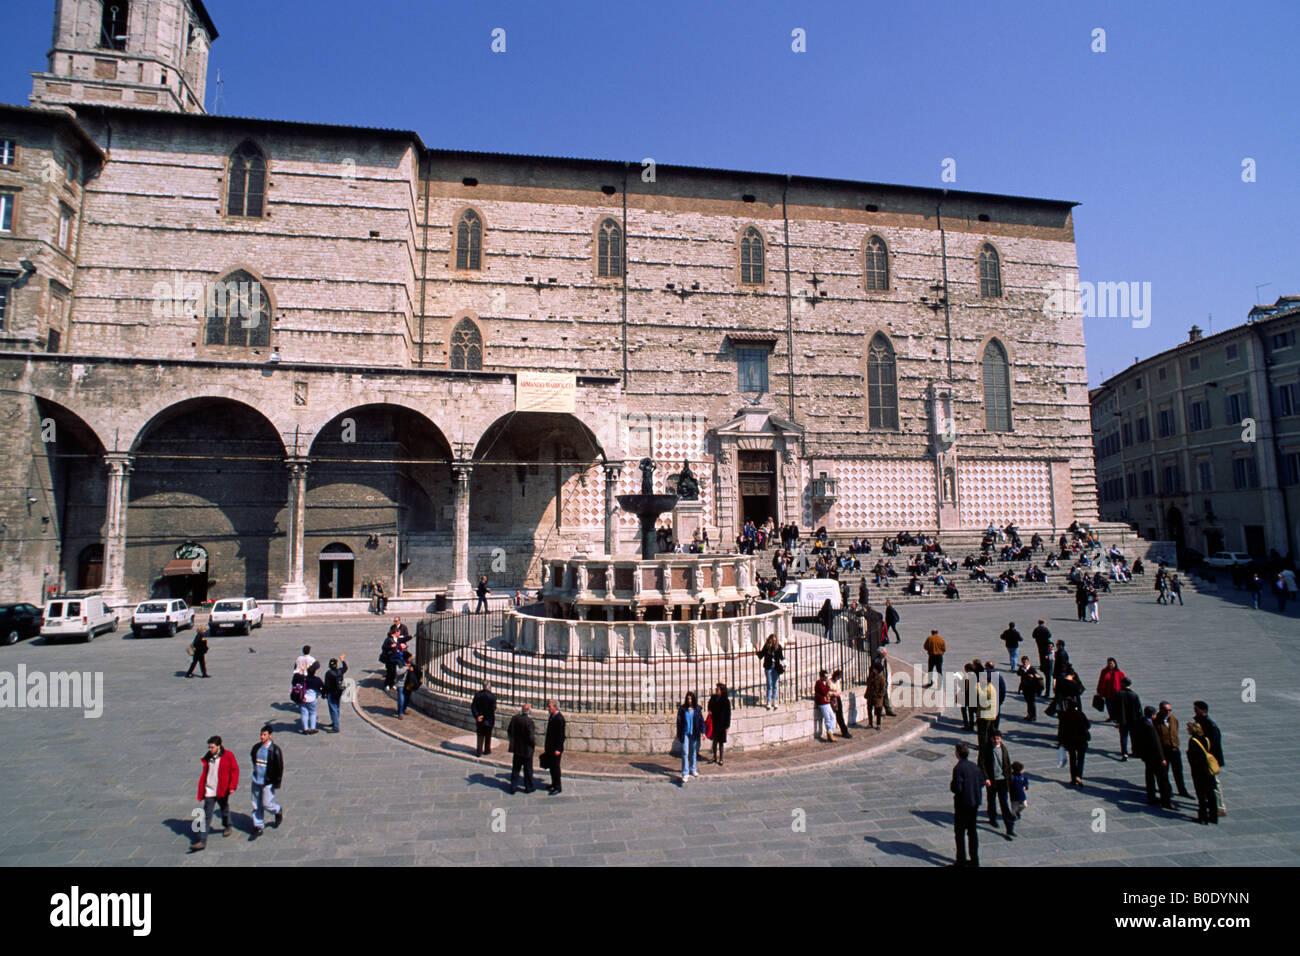 italy, umbria, perugia, piazza IV novembre, fontana maggiore and cathedral - Stock Image